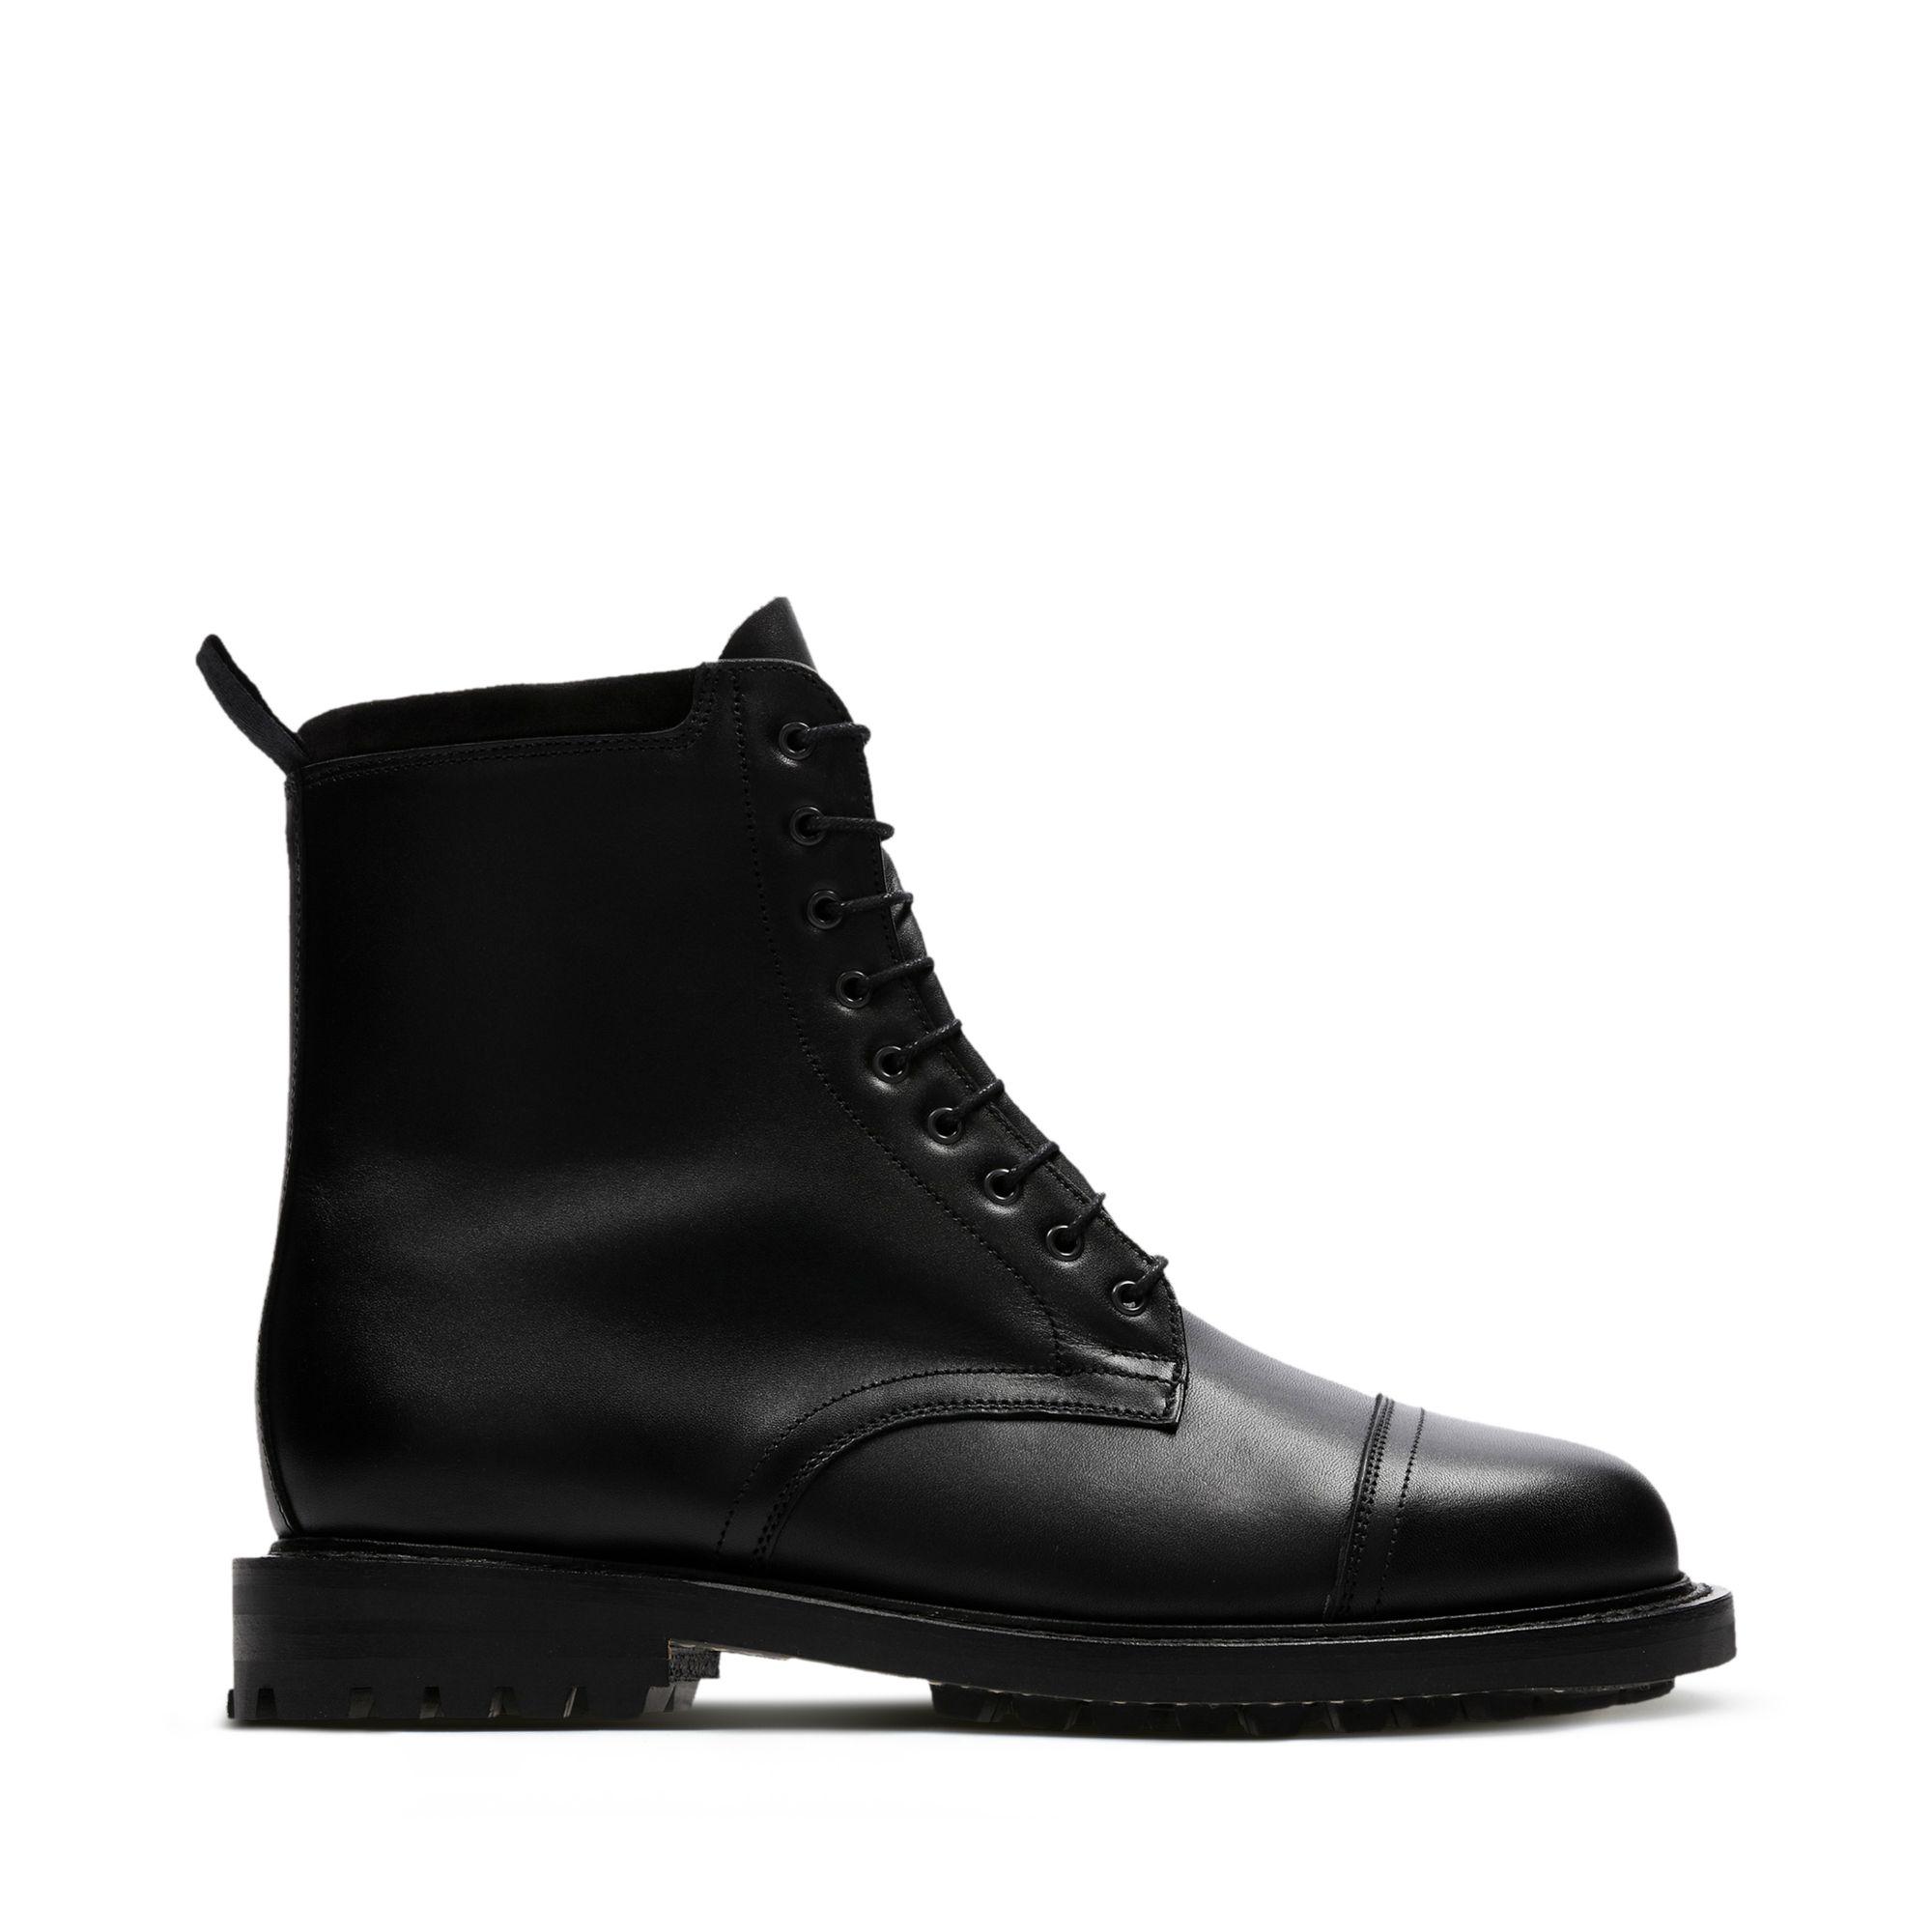 Vintage Style 1950s Men S Shoes Rockabilly Boots Amp Shoes